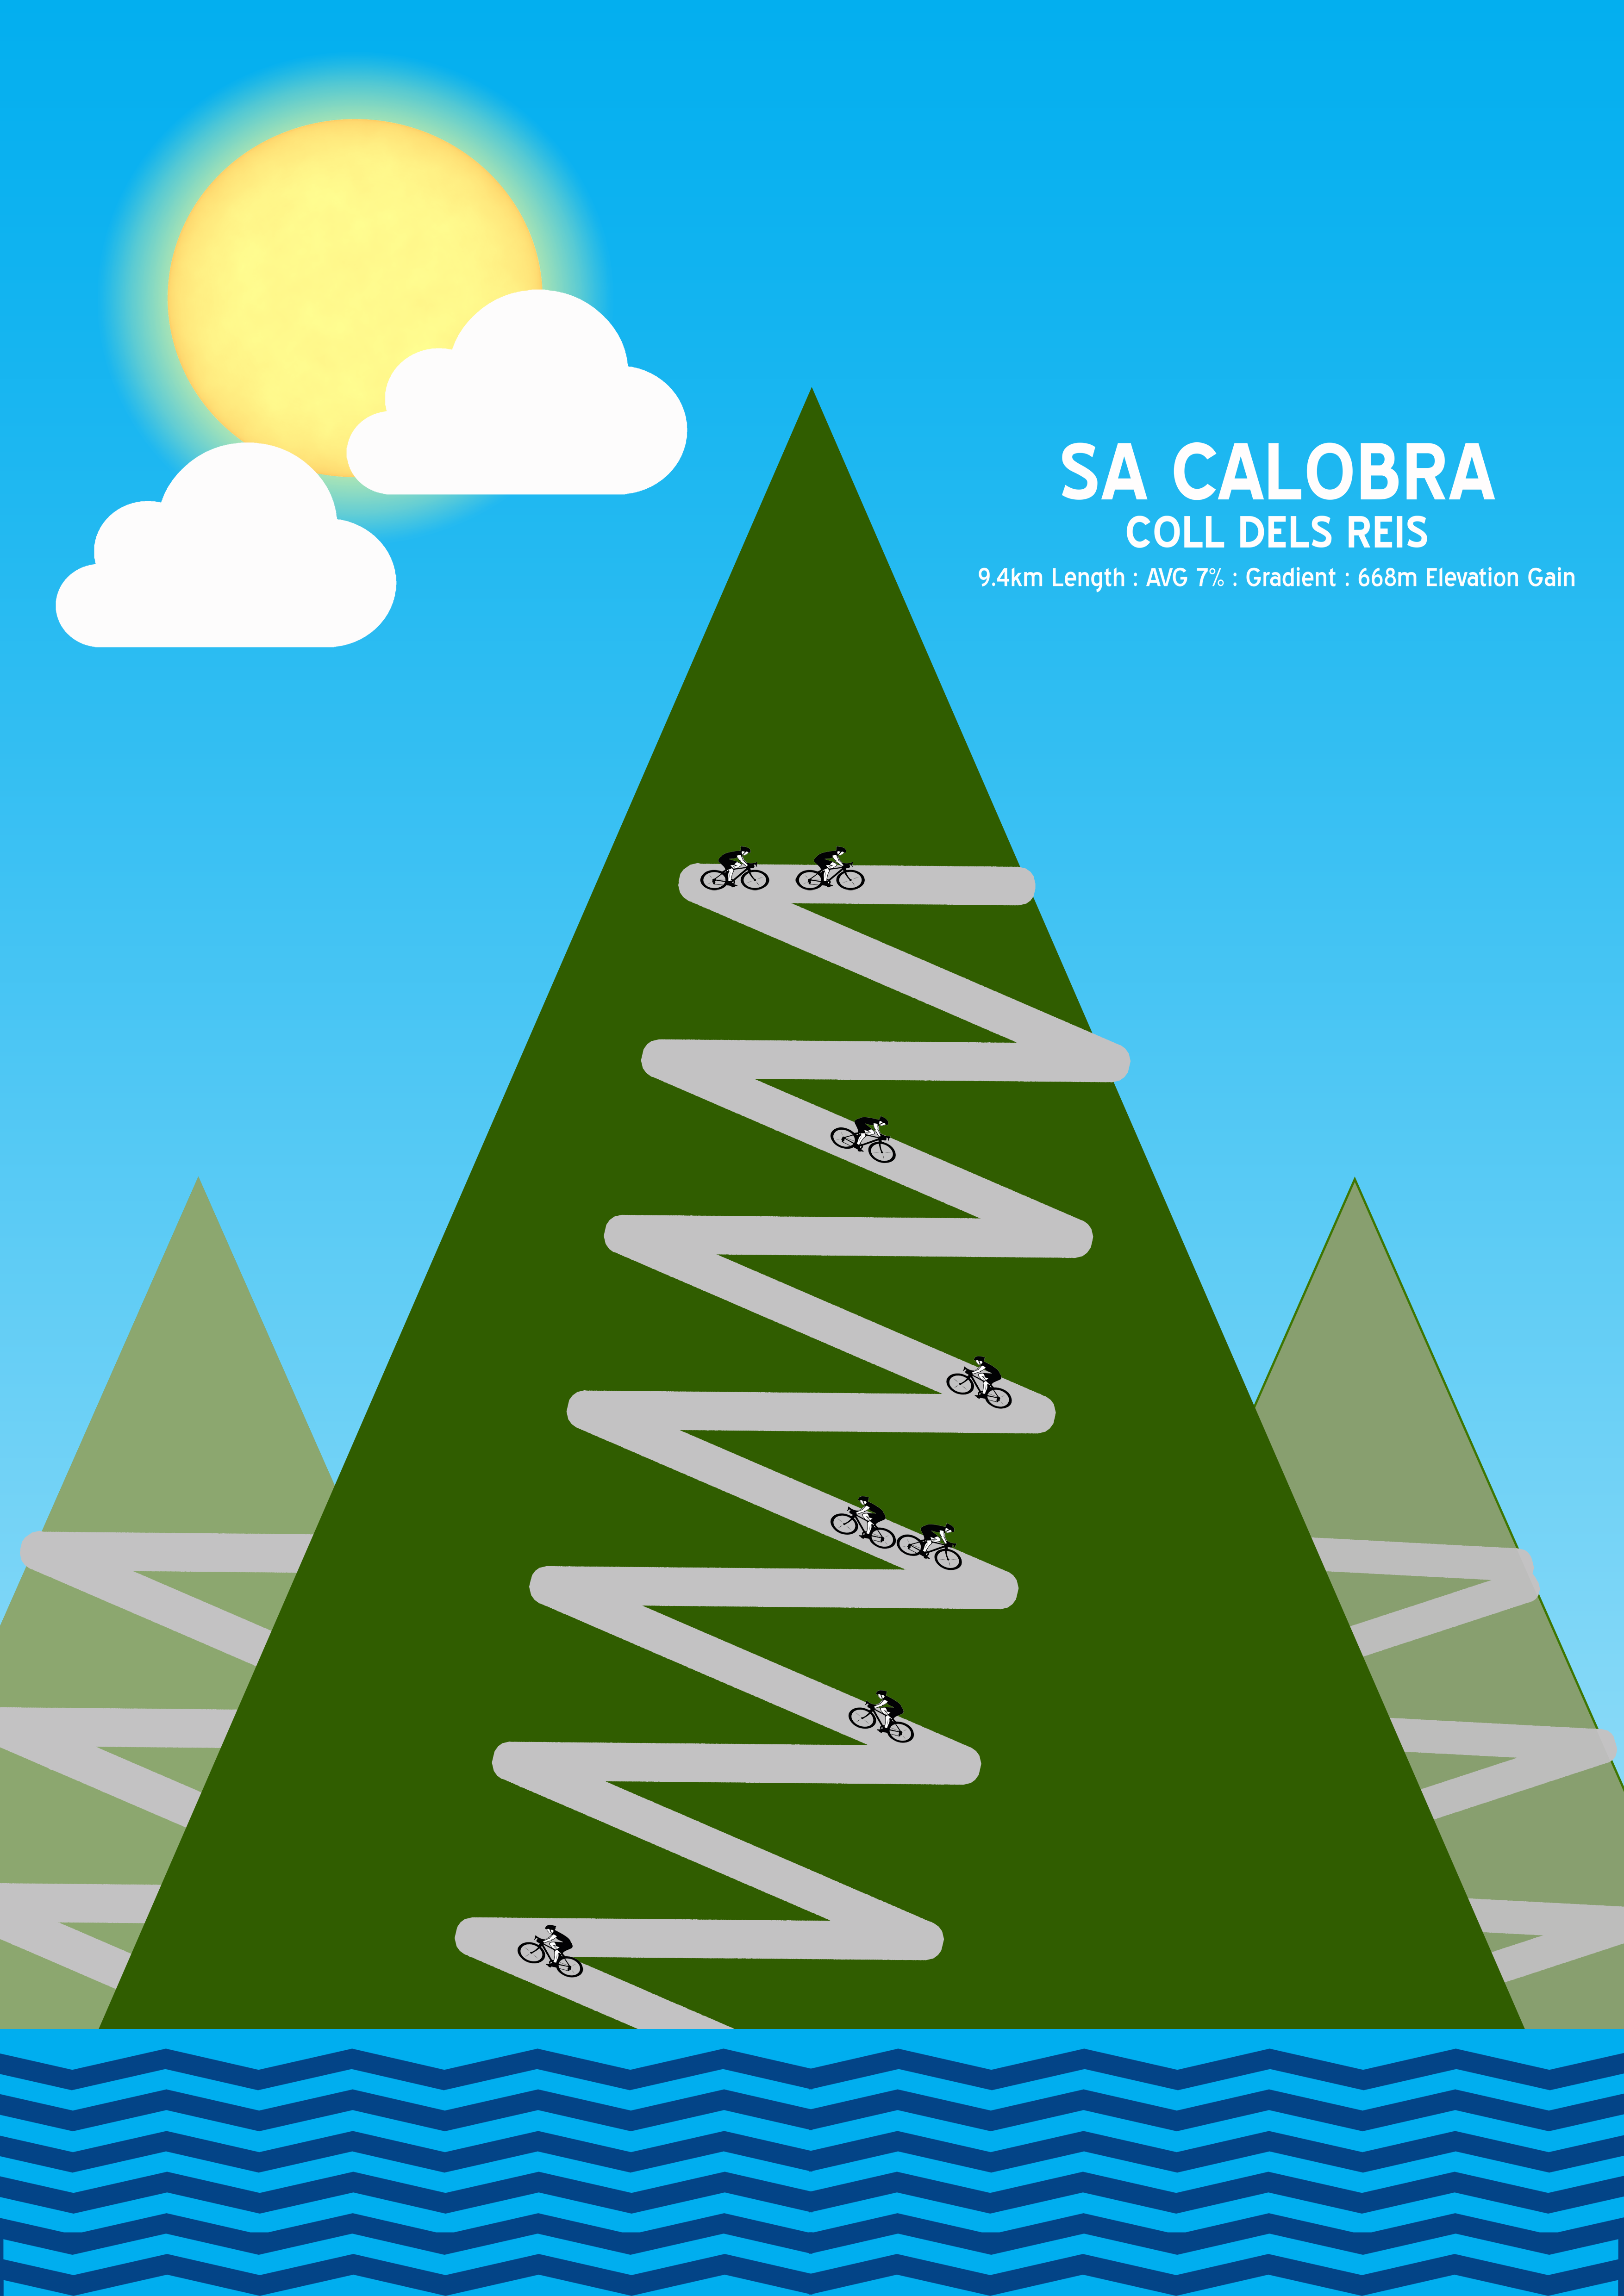 Sa Calobra | Cycling art | Pinterest | Cycling and Cycling art